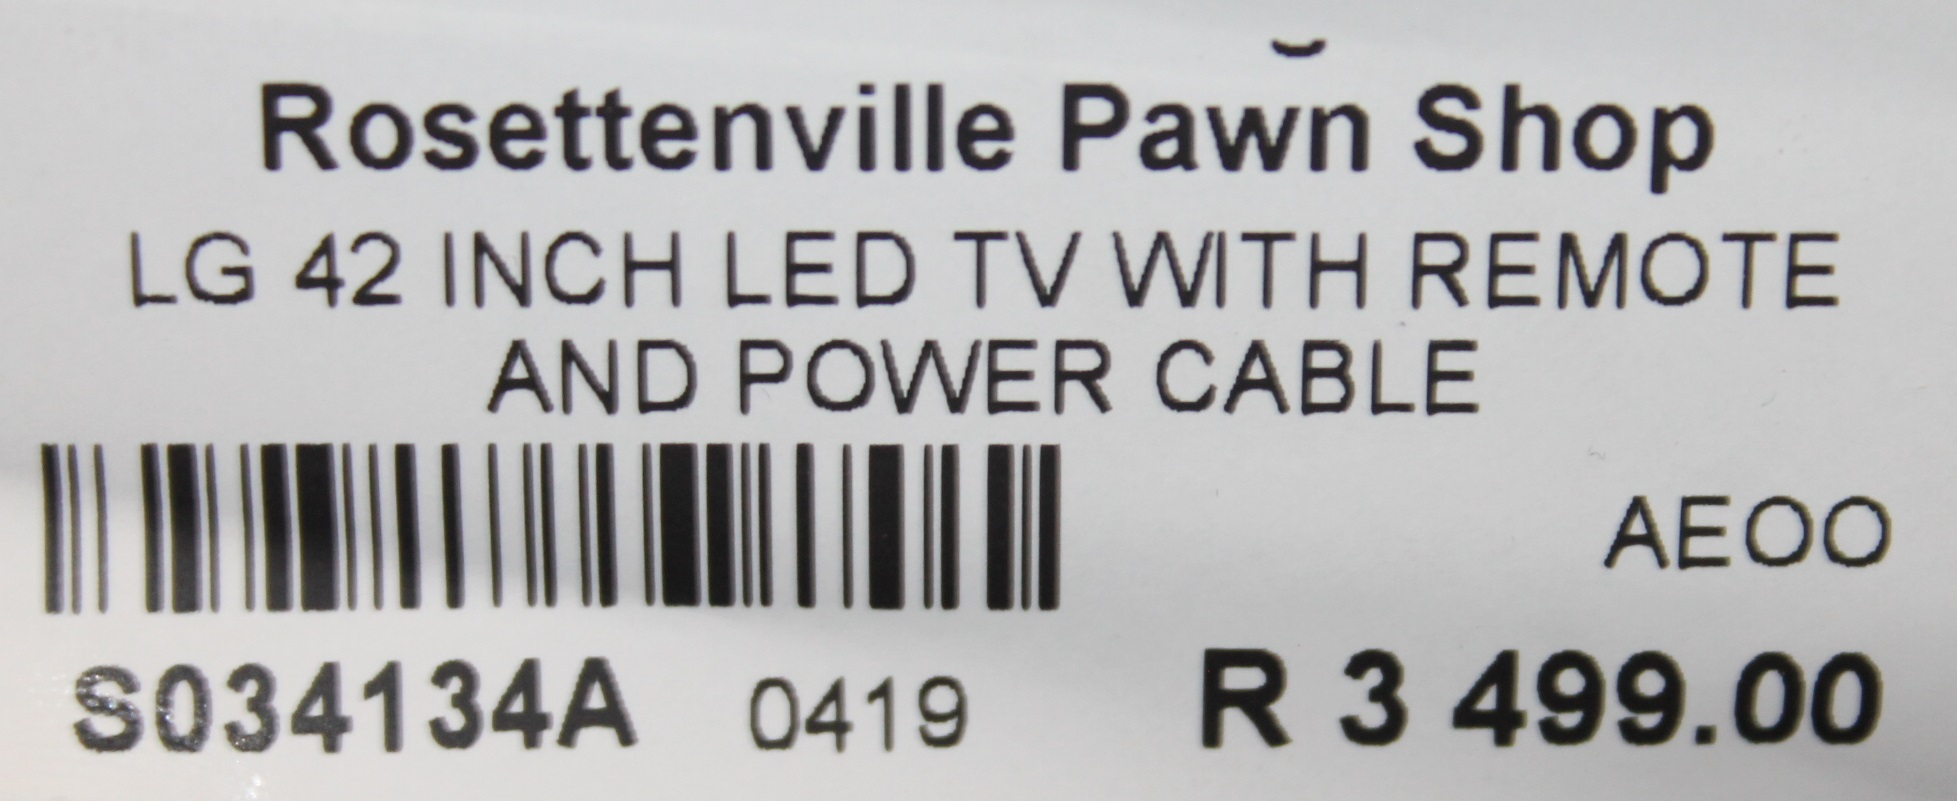 S034134A LG 42 inch LED tv #Rosettenvillepawnshop